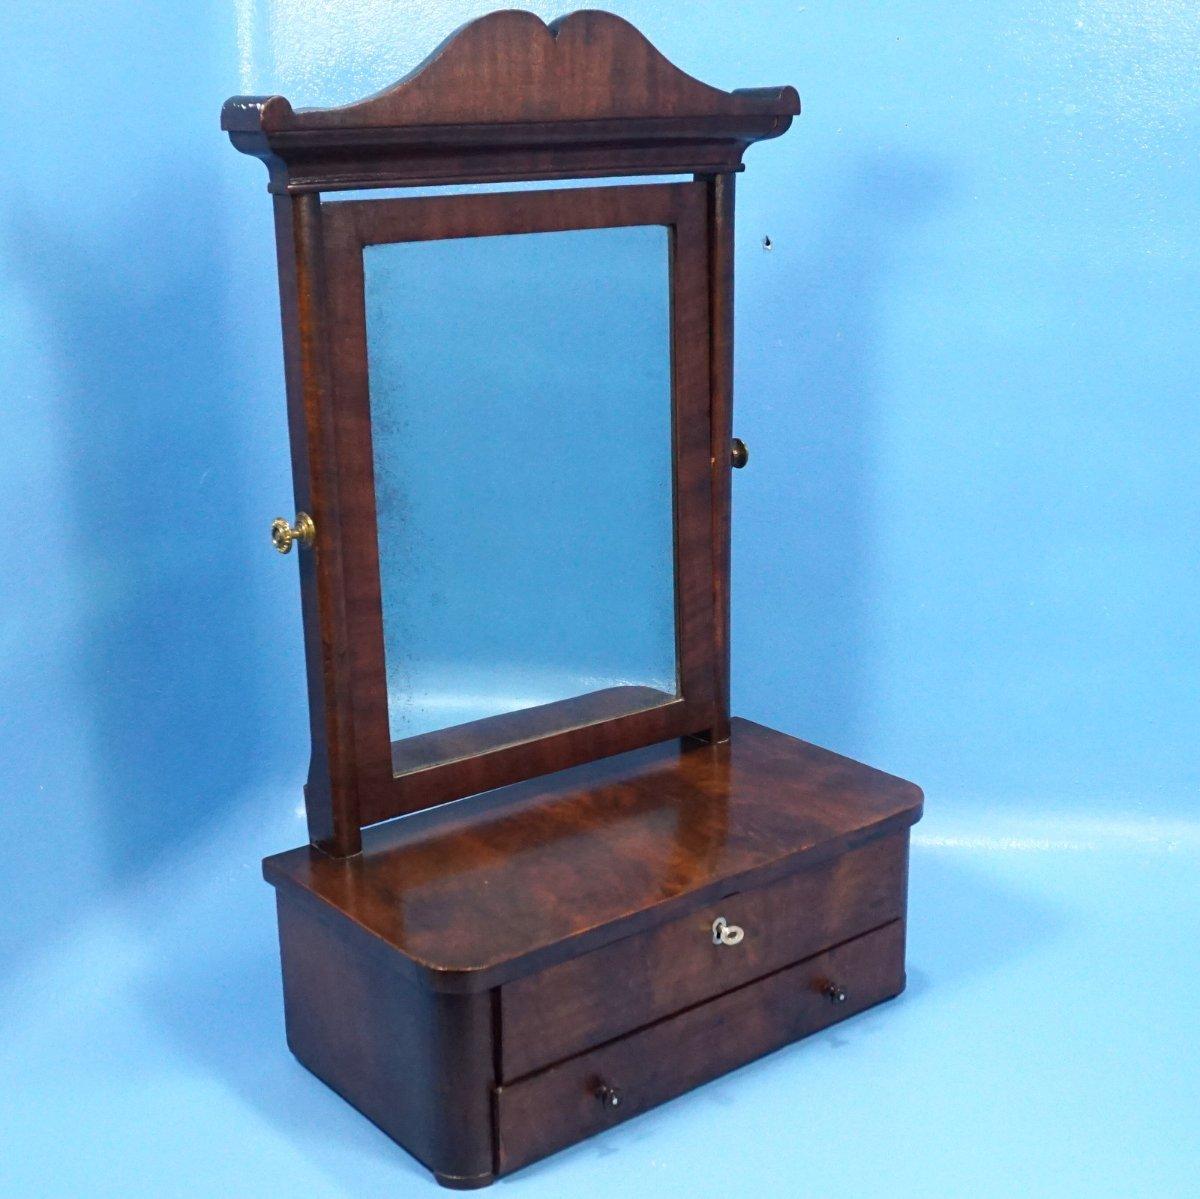 Antique German Table Top Vanity Mirror 2 Drawers Mahogany C1890 Ebay